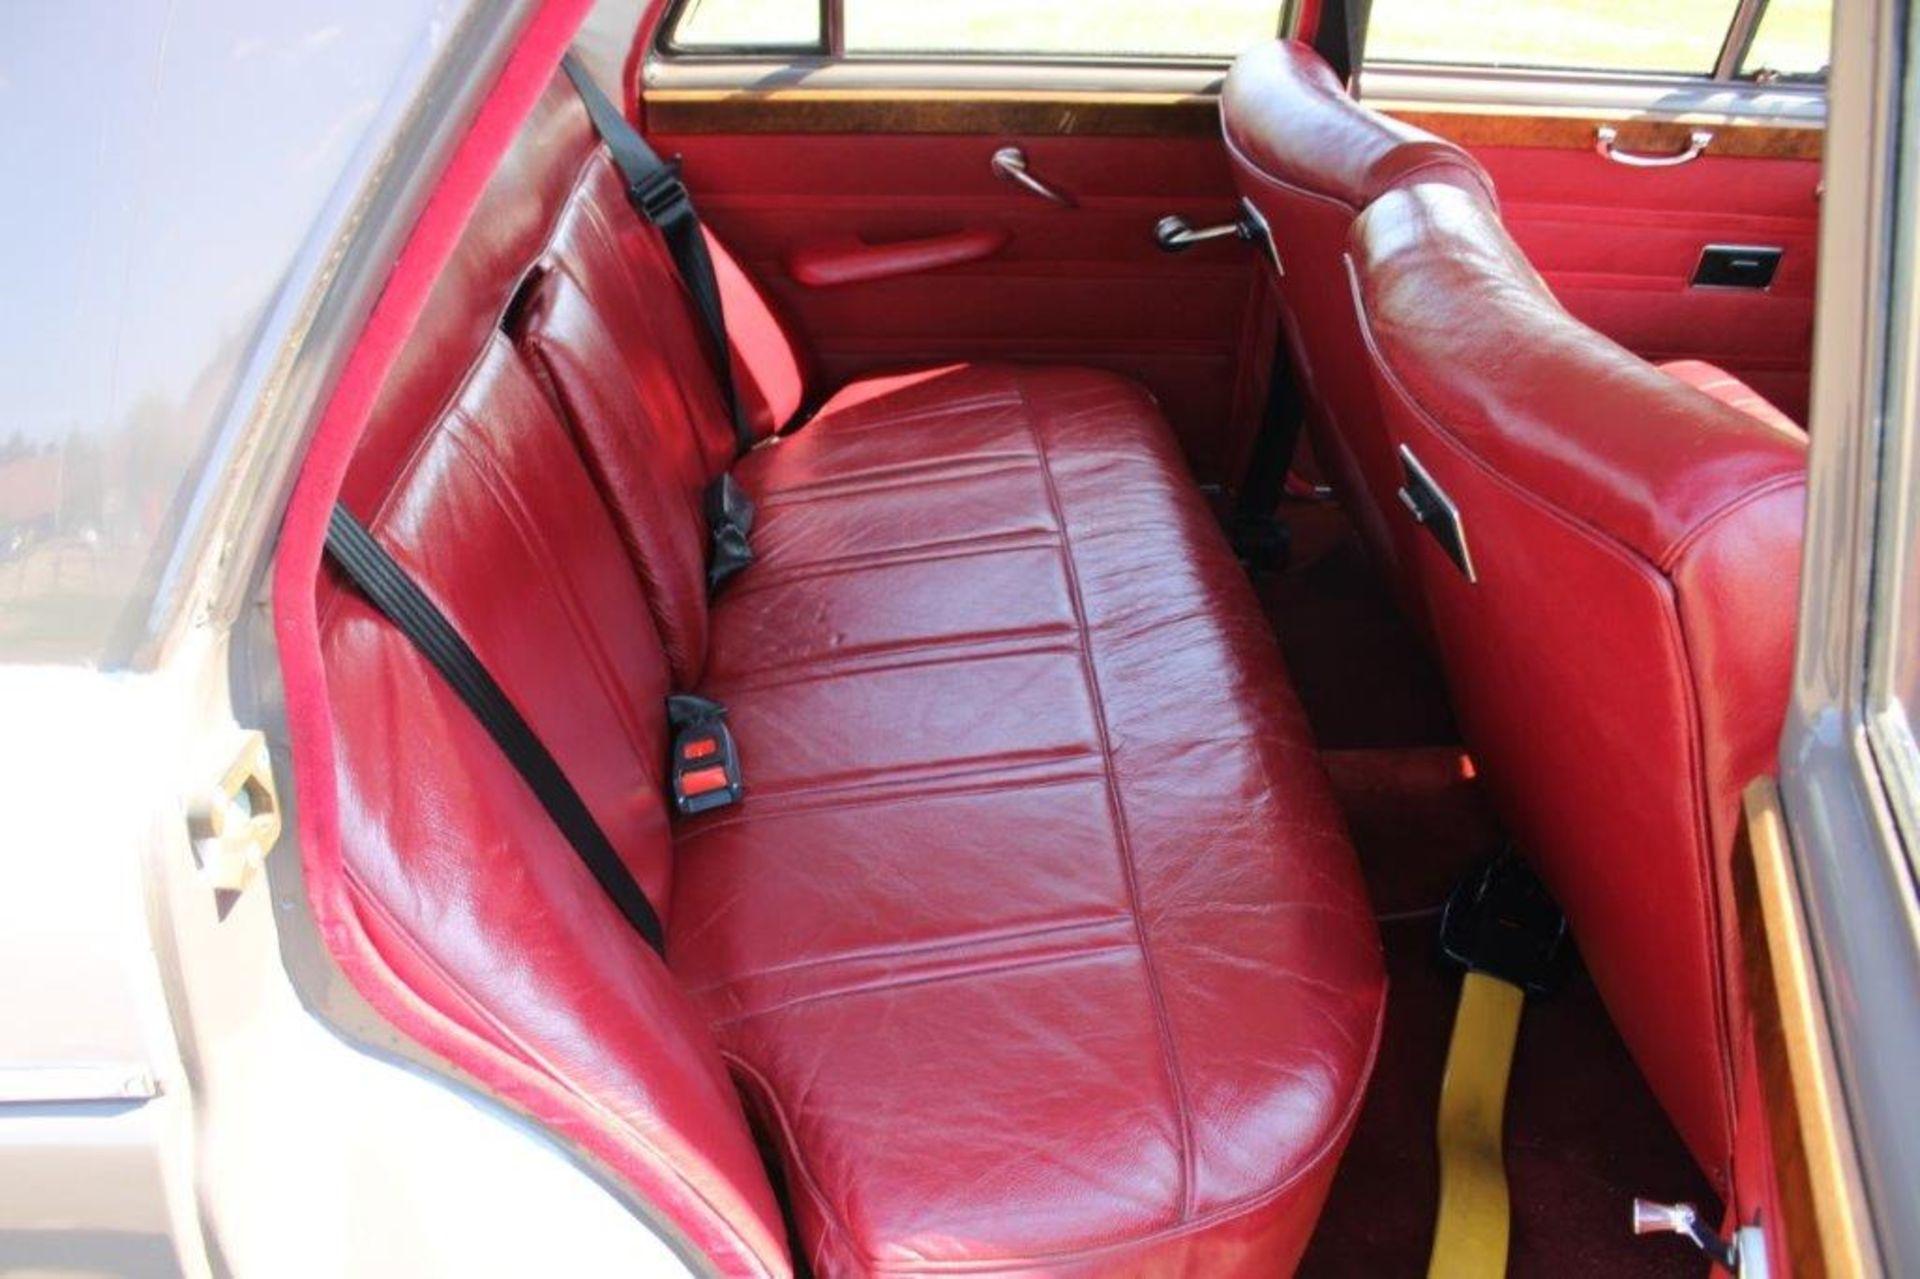 1969 Wolseley 16/60 Auto - Image 21 of 31